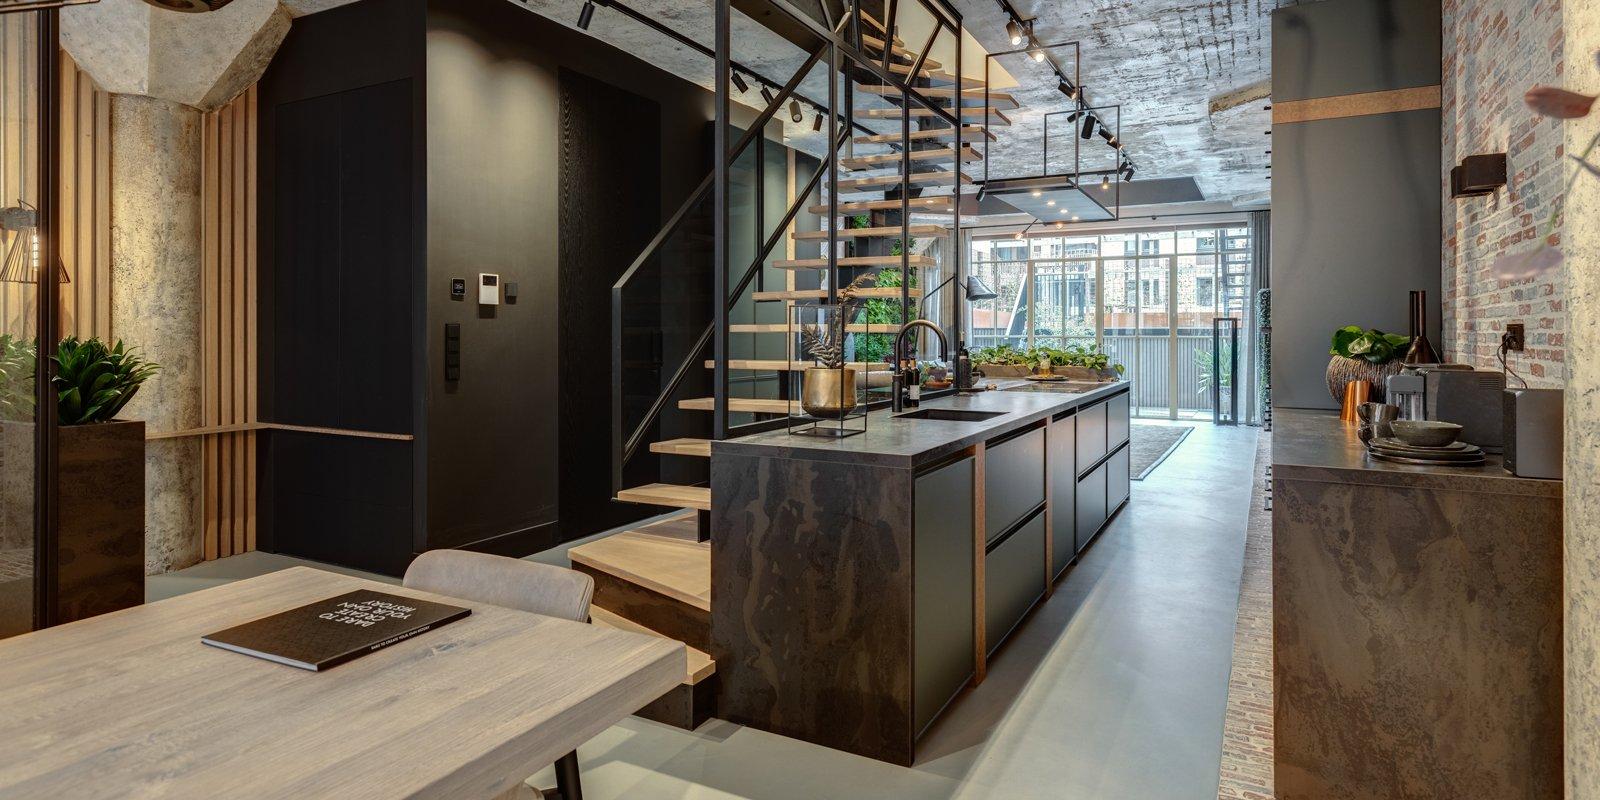 cosnetino, the art of living, natuursteen keuken